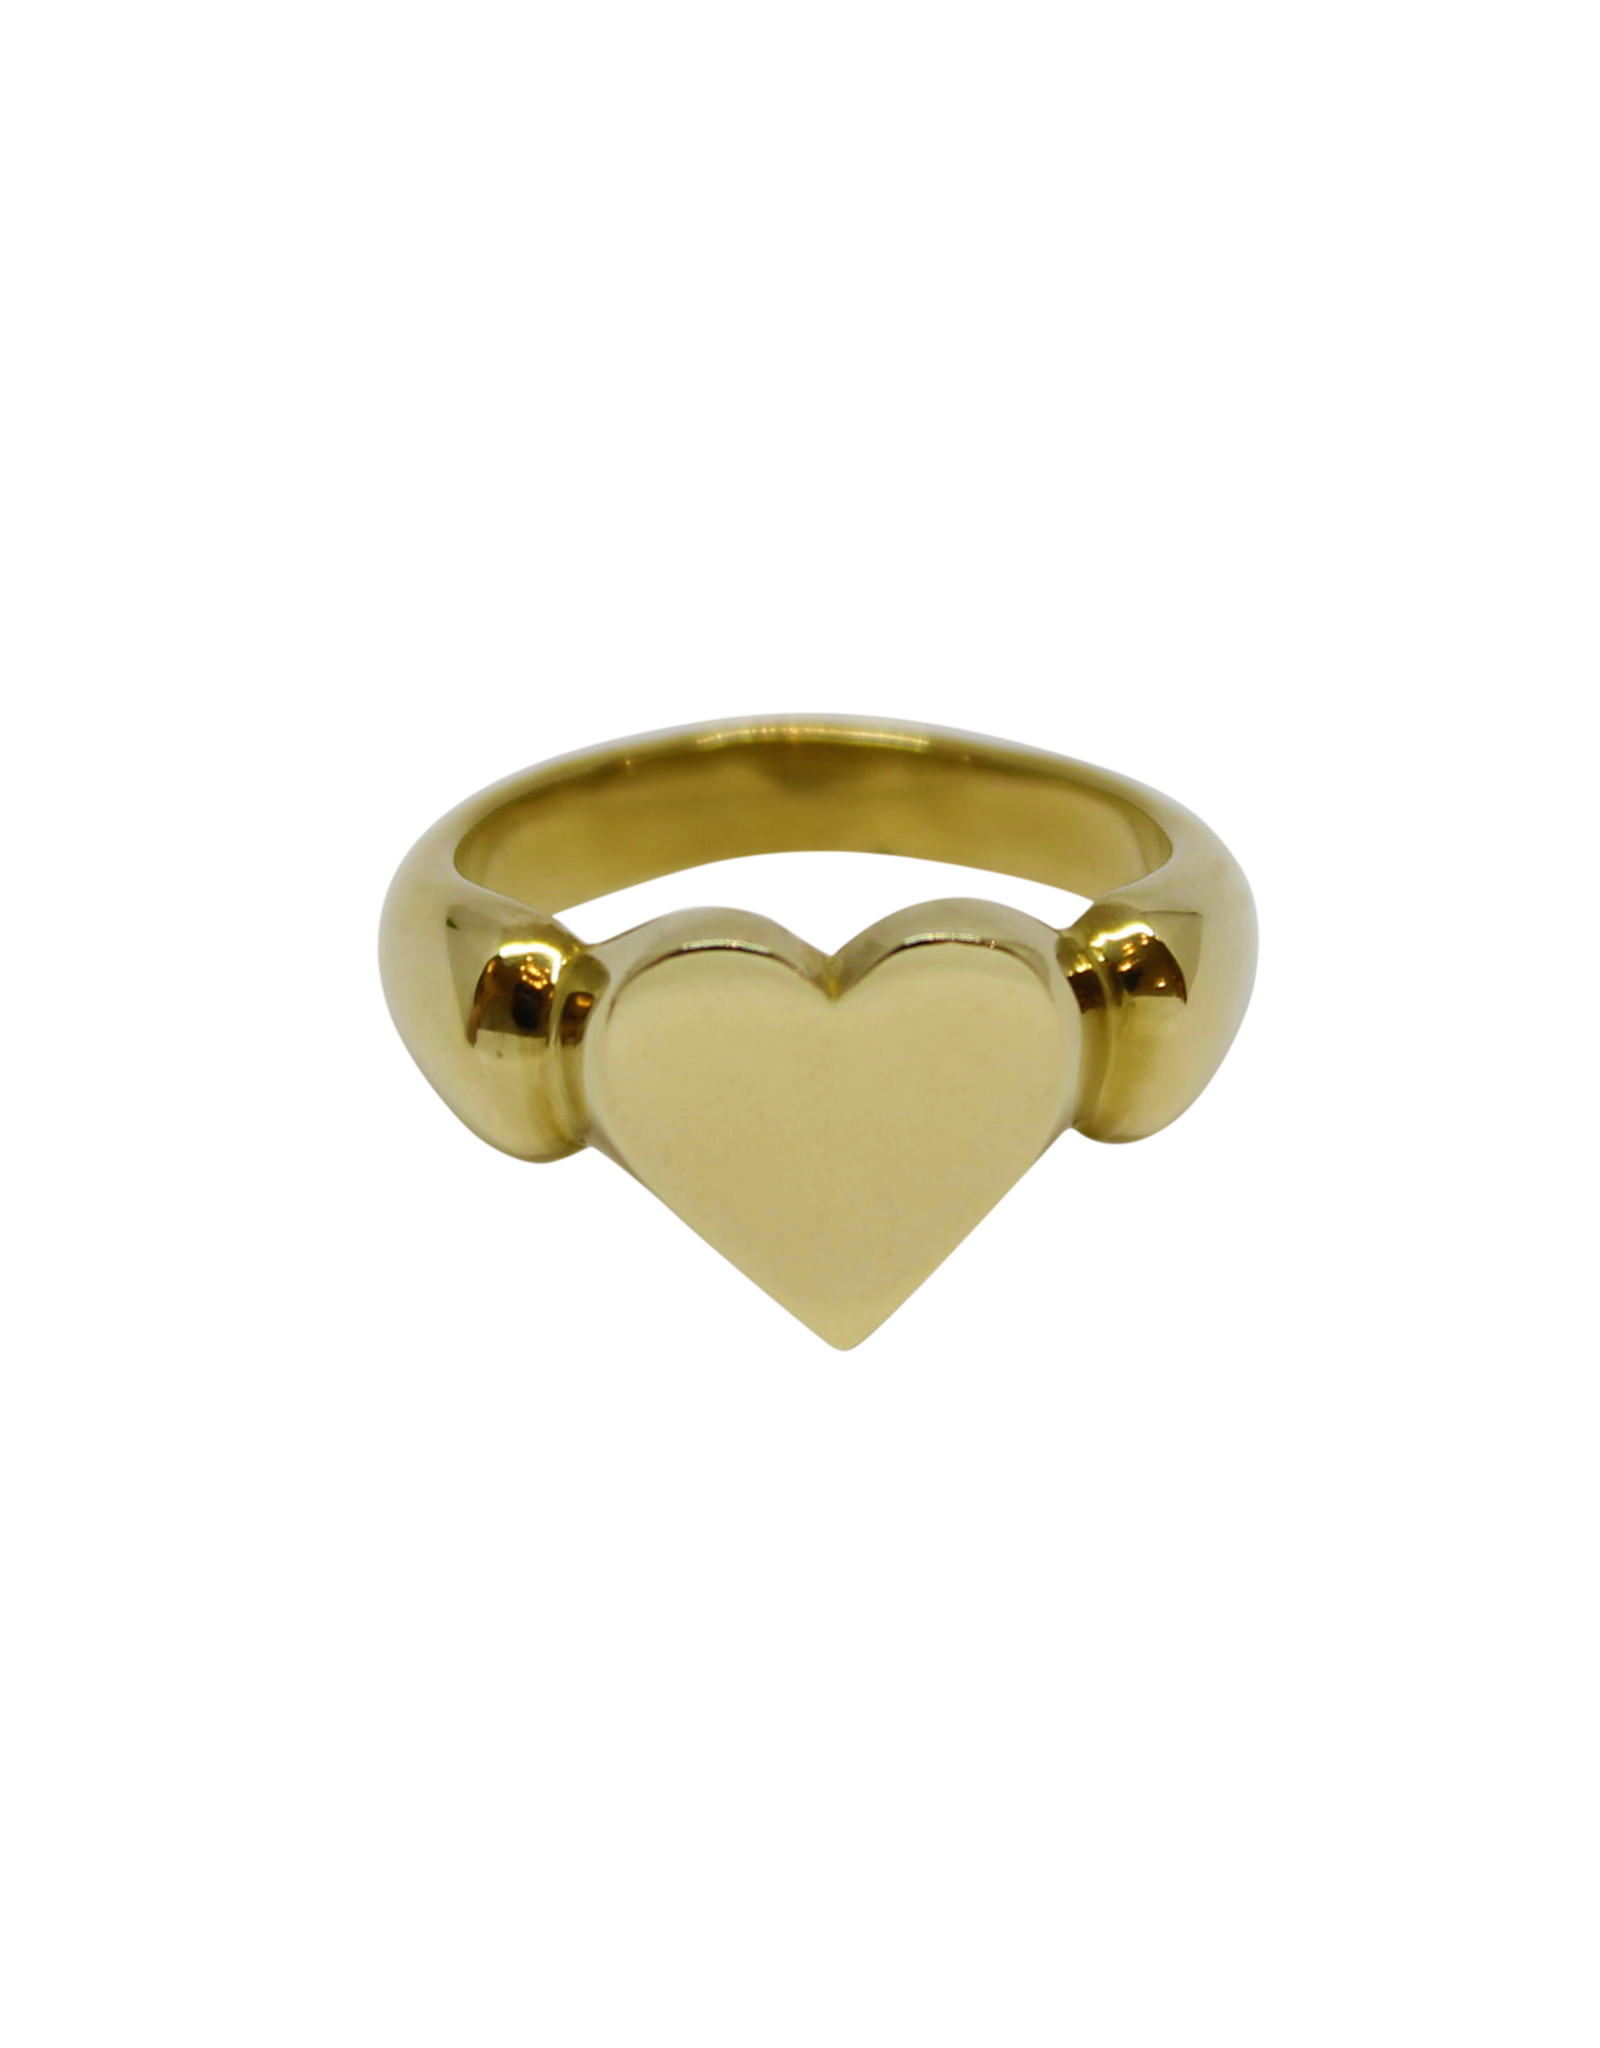 Vayu Jewels Vintage Heart Ring - Sz. 8